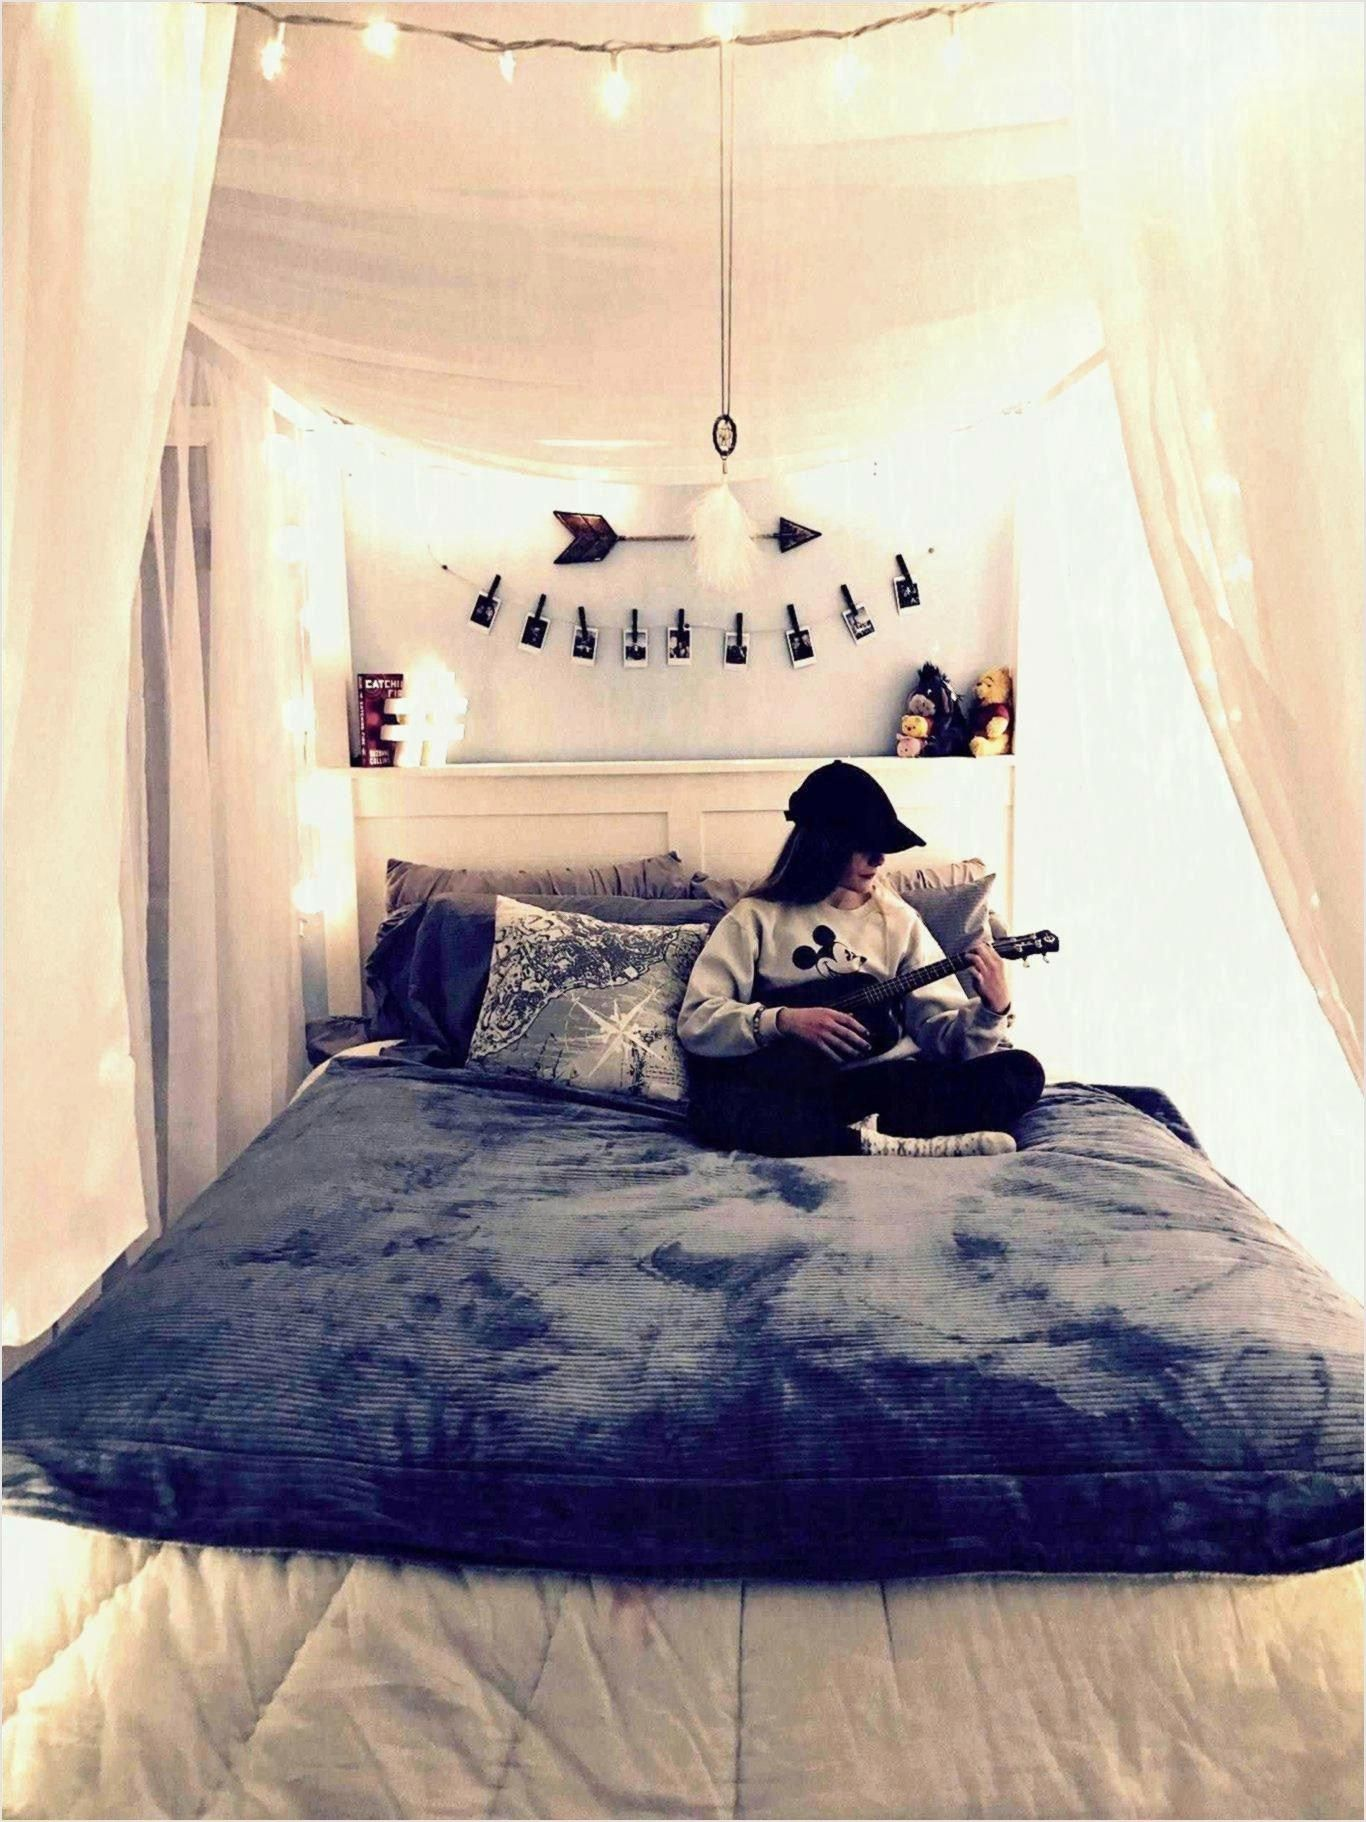 Cozy Bedroom Aesthetic Teenage Girl Bedroom - Cozy Bedroom ... on Cozy Teenage Room Decor  id=12137